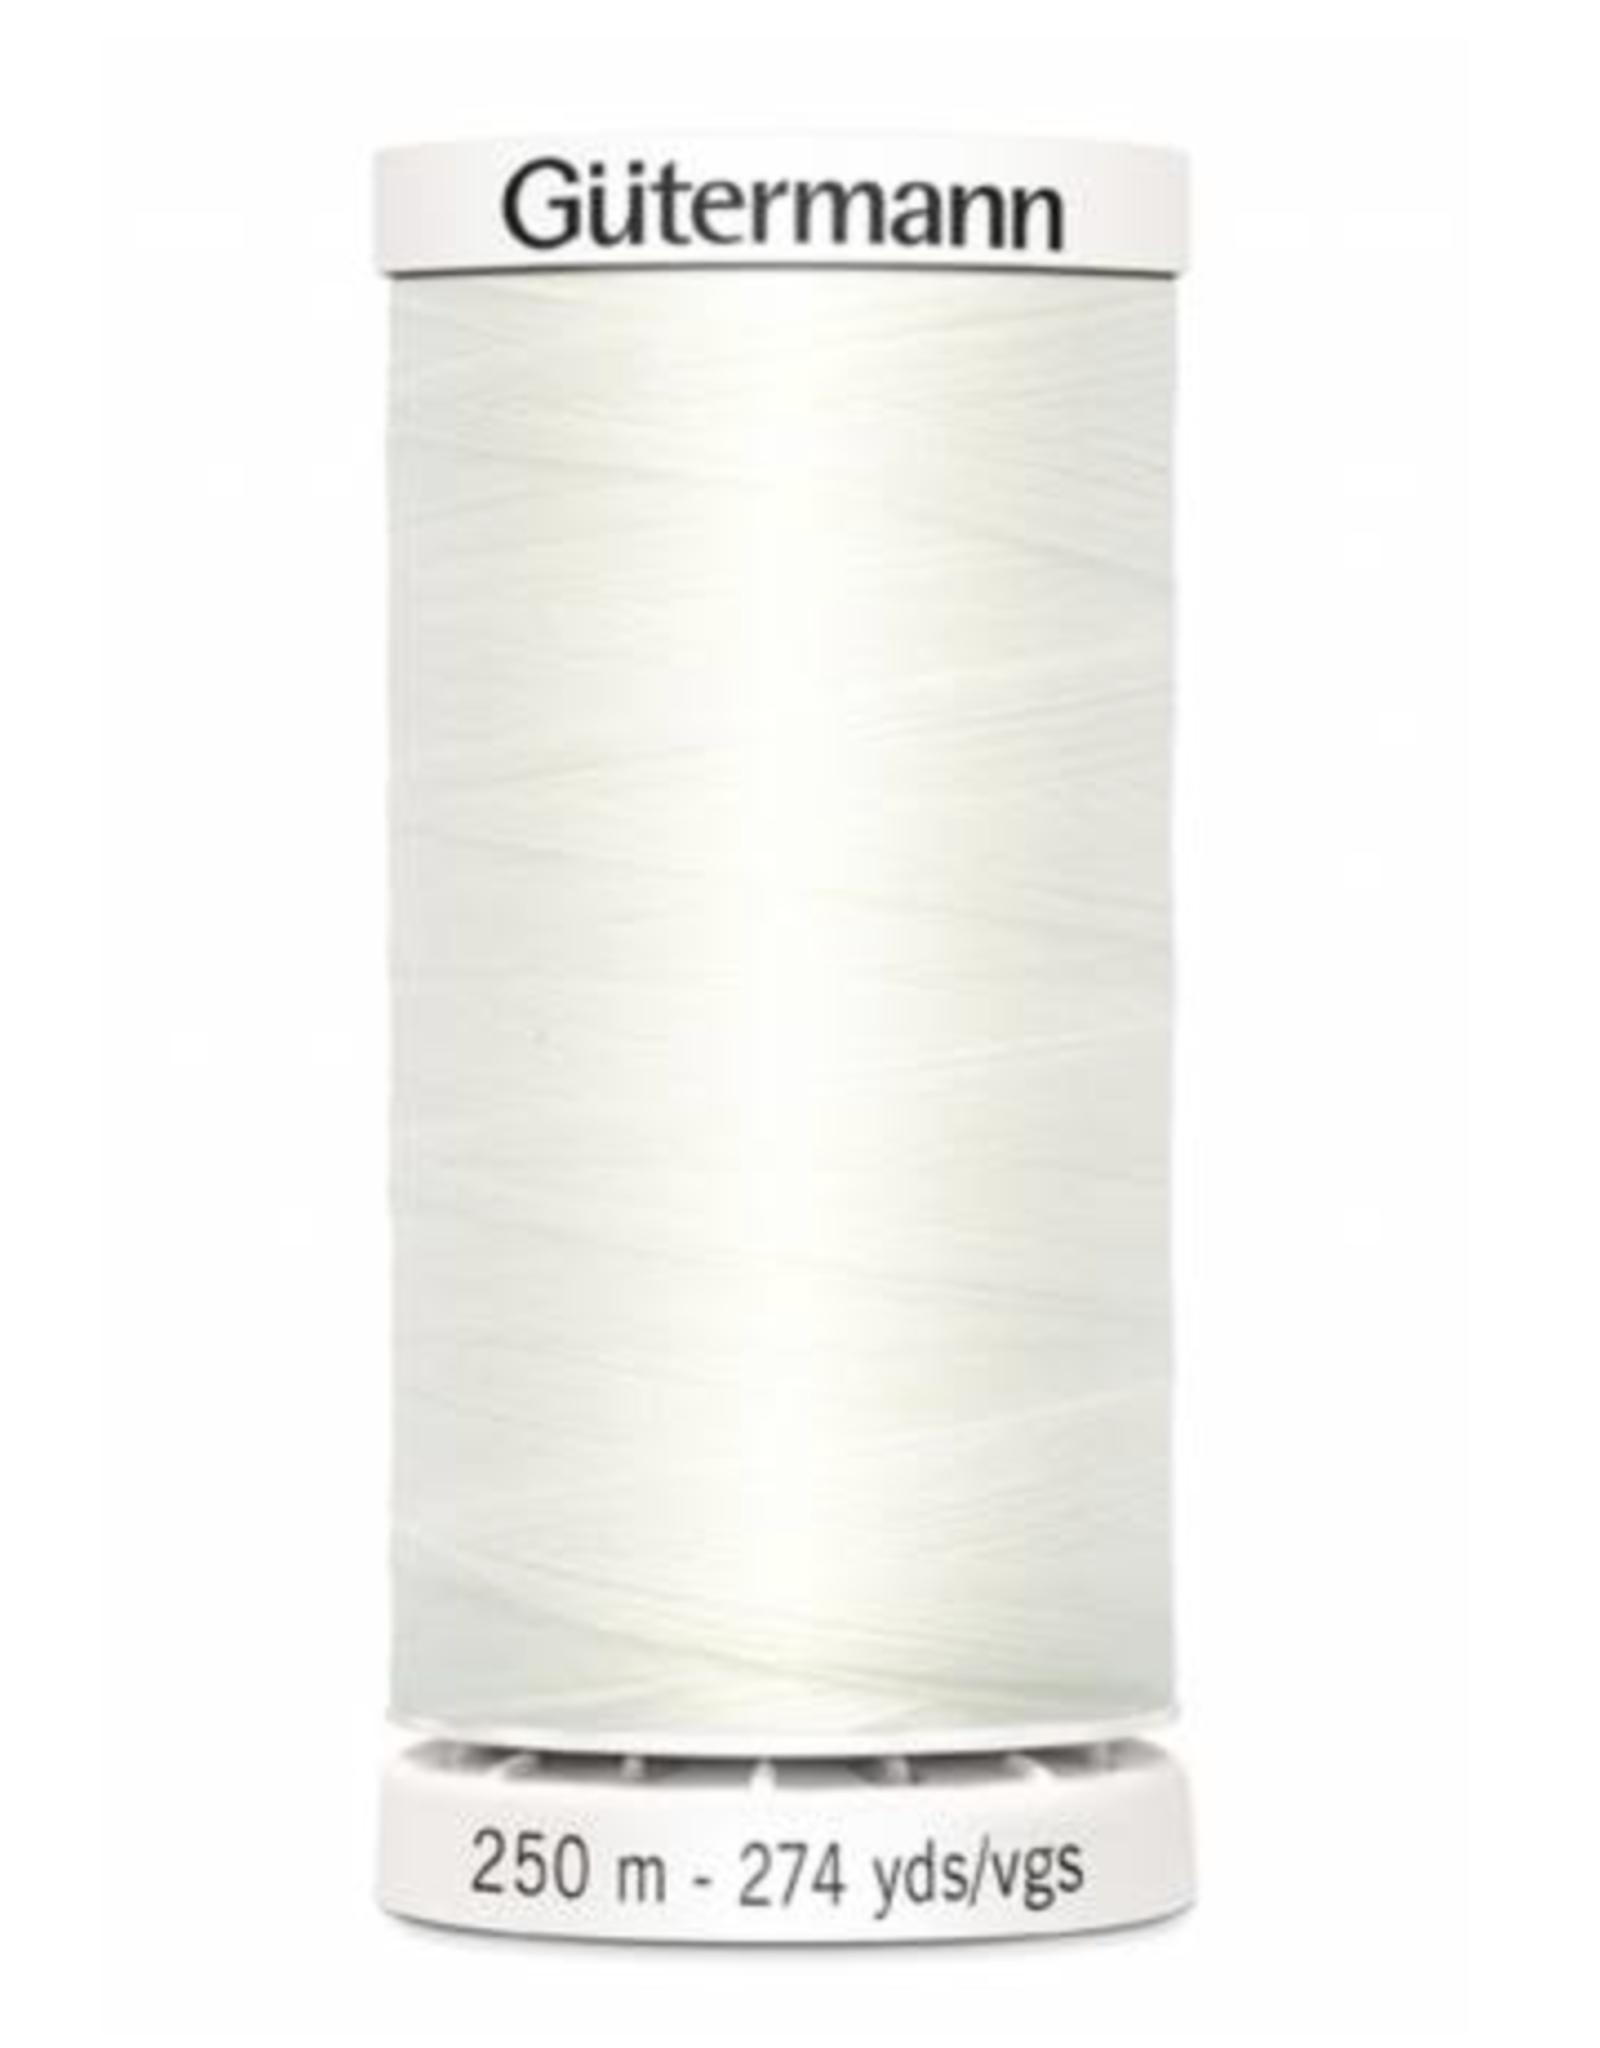 Gutermann Sew-all Polyester All Purpose Thread